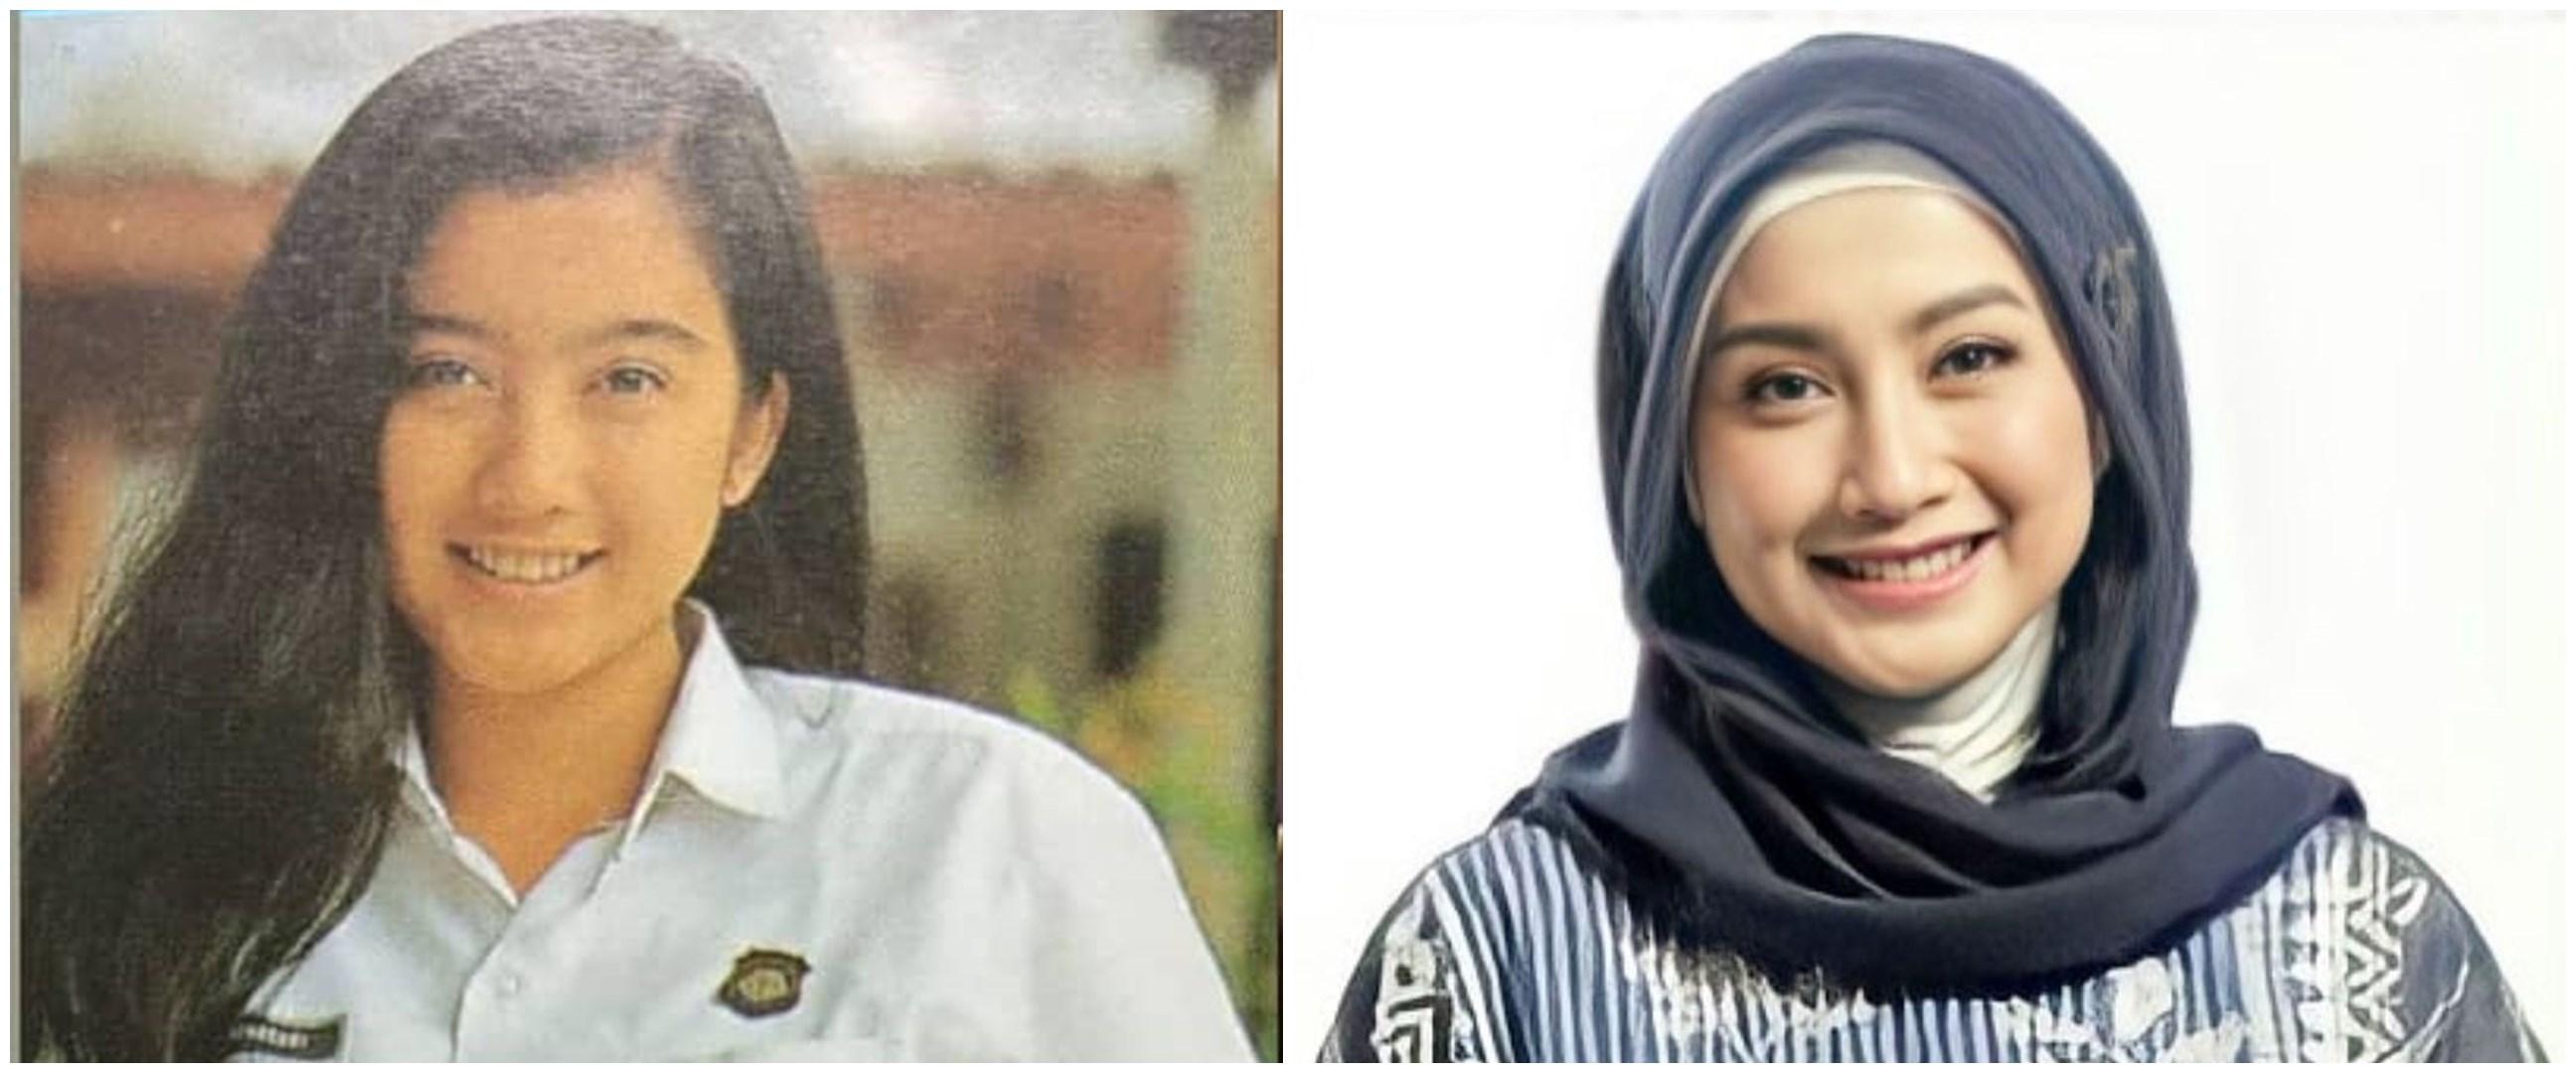 10 Potret transformasi Desy Ratnasari, foto masa SMA jadi sorotan